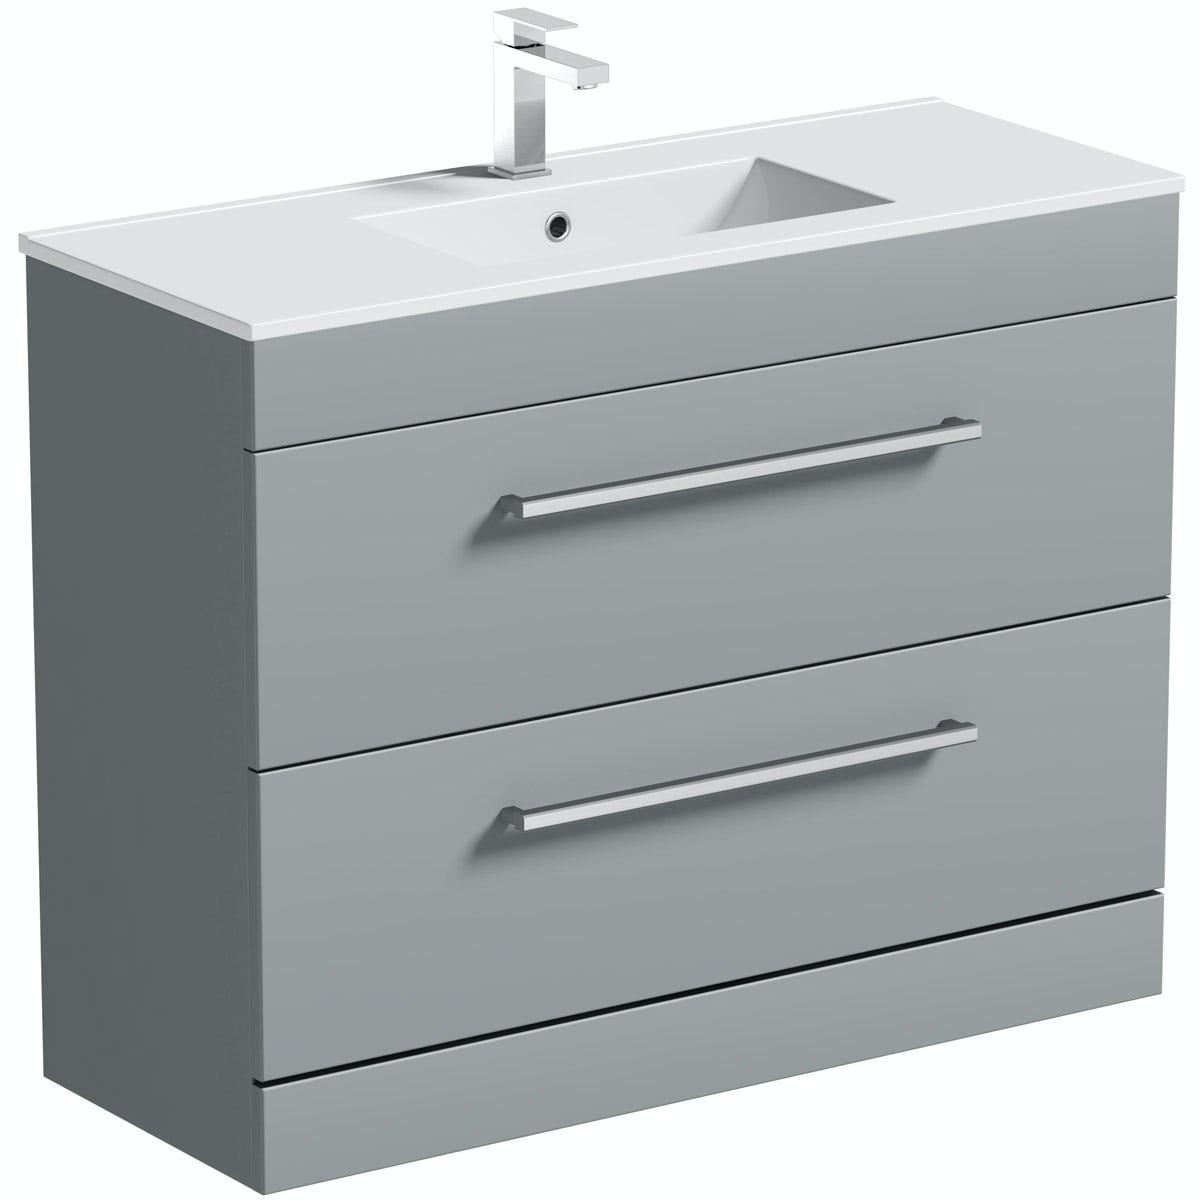 Orchard Derwent grey vanity drawer unit and basin 1000mm